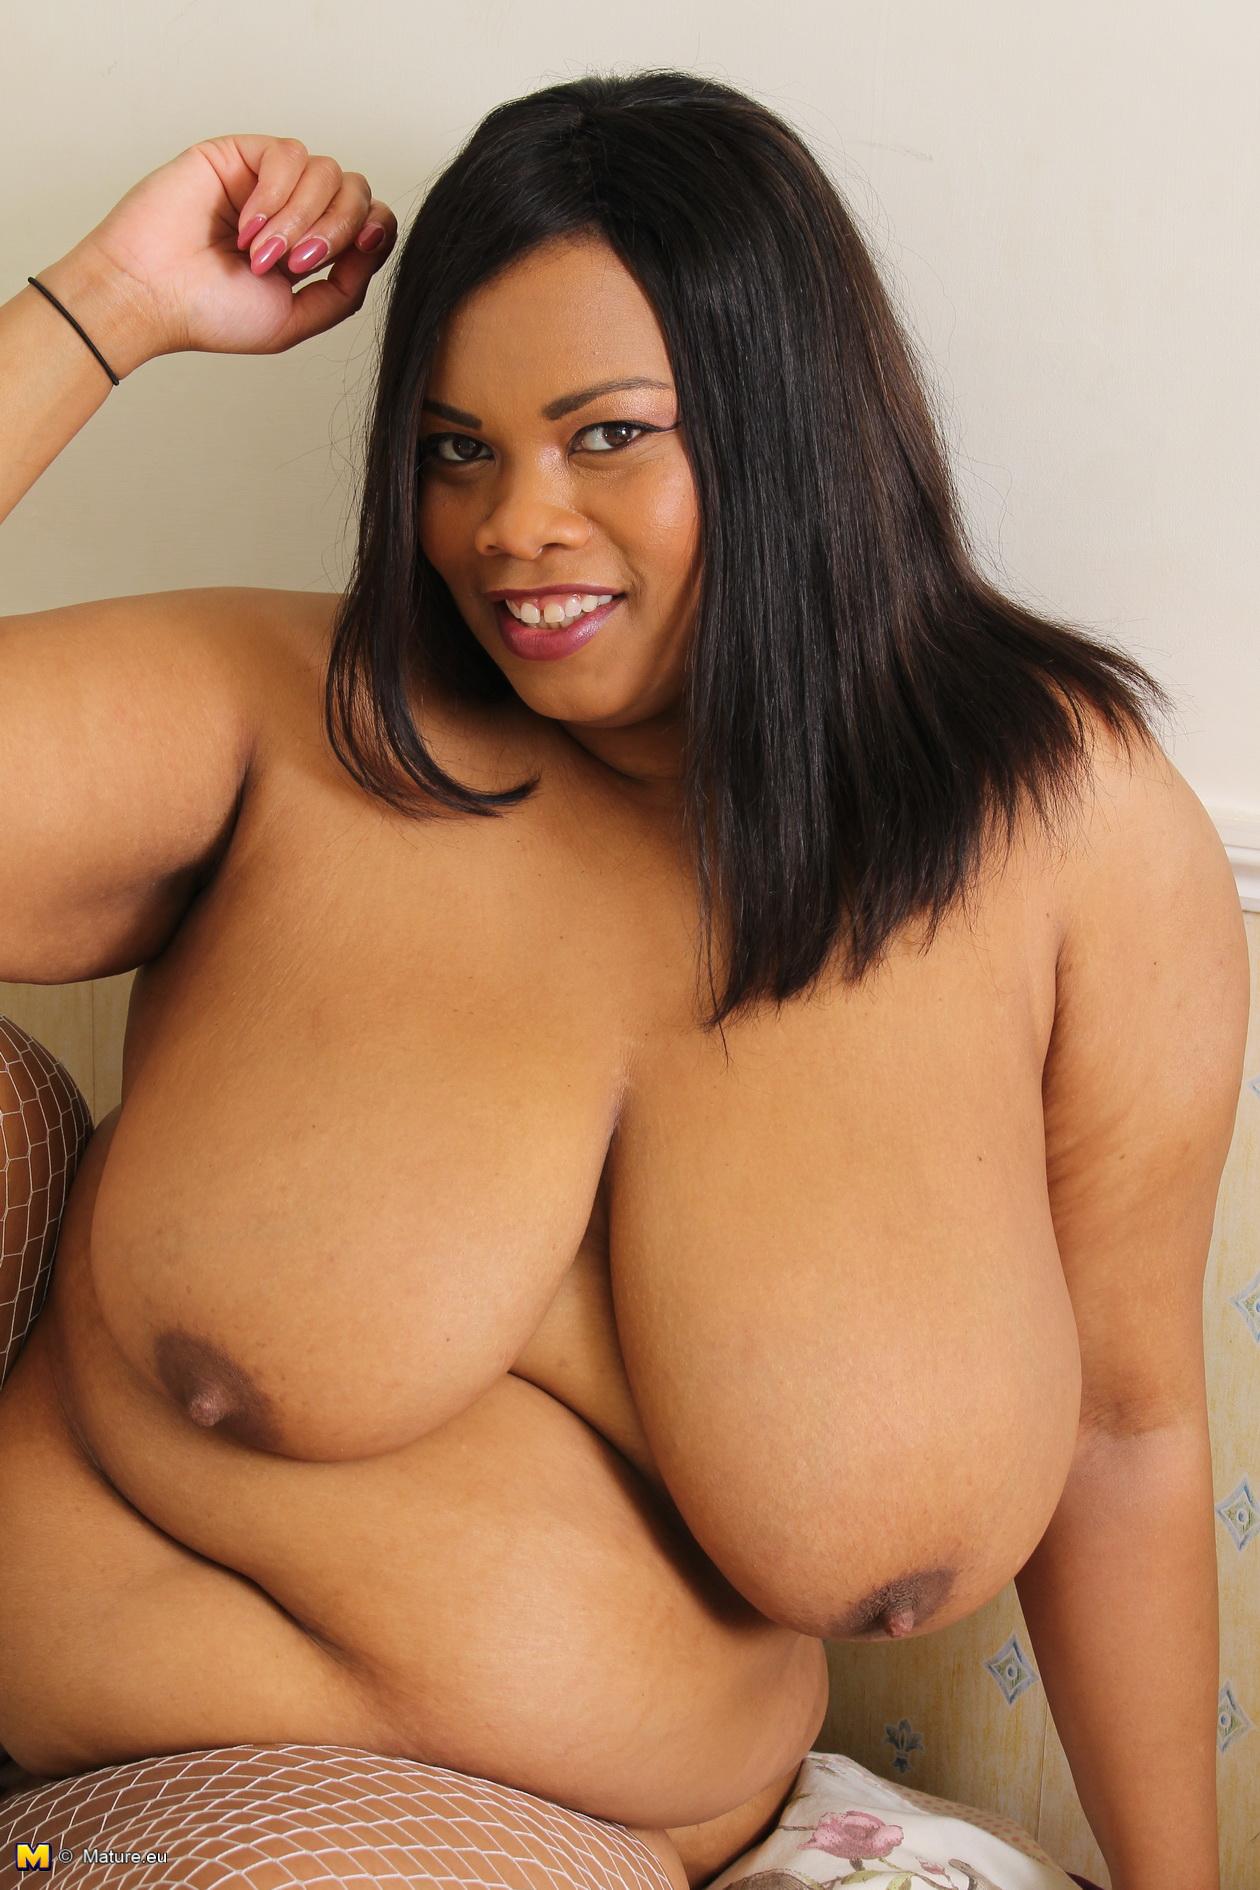 Homemade Chubby Bbw Big Tits